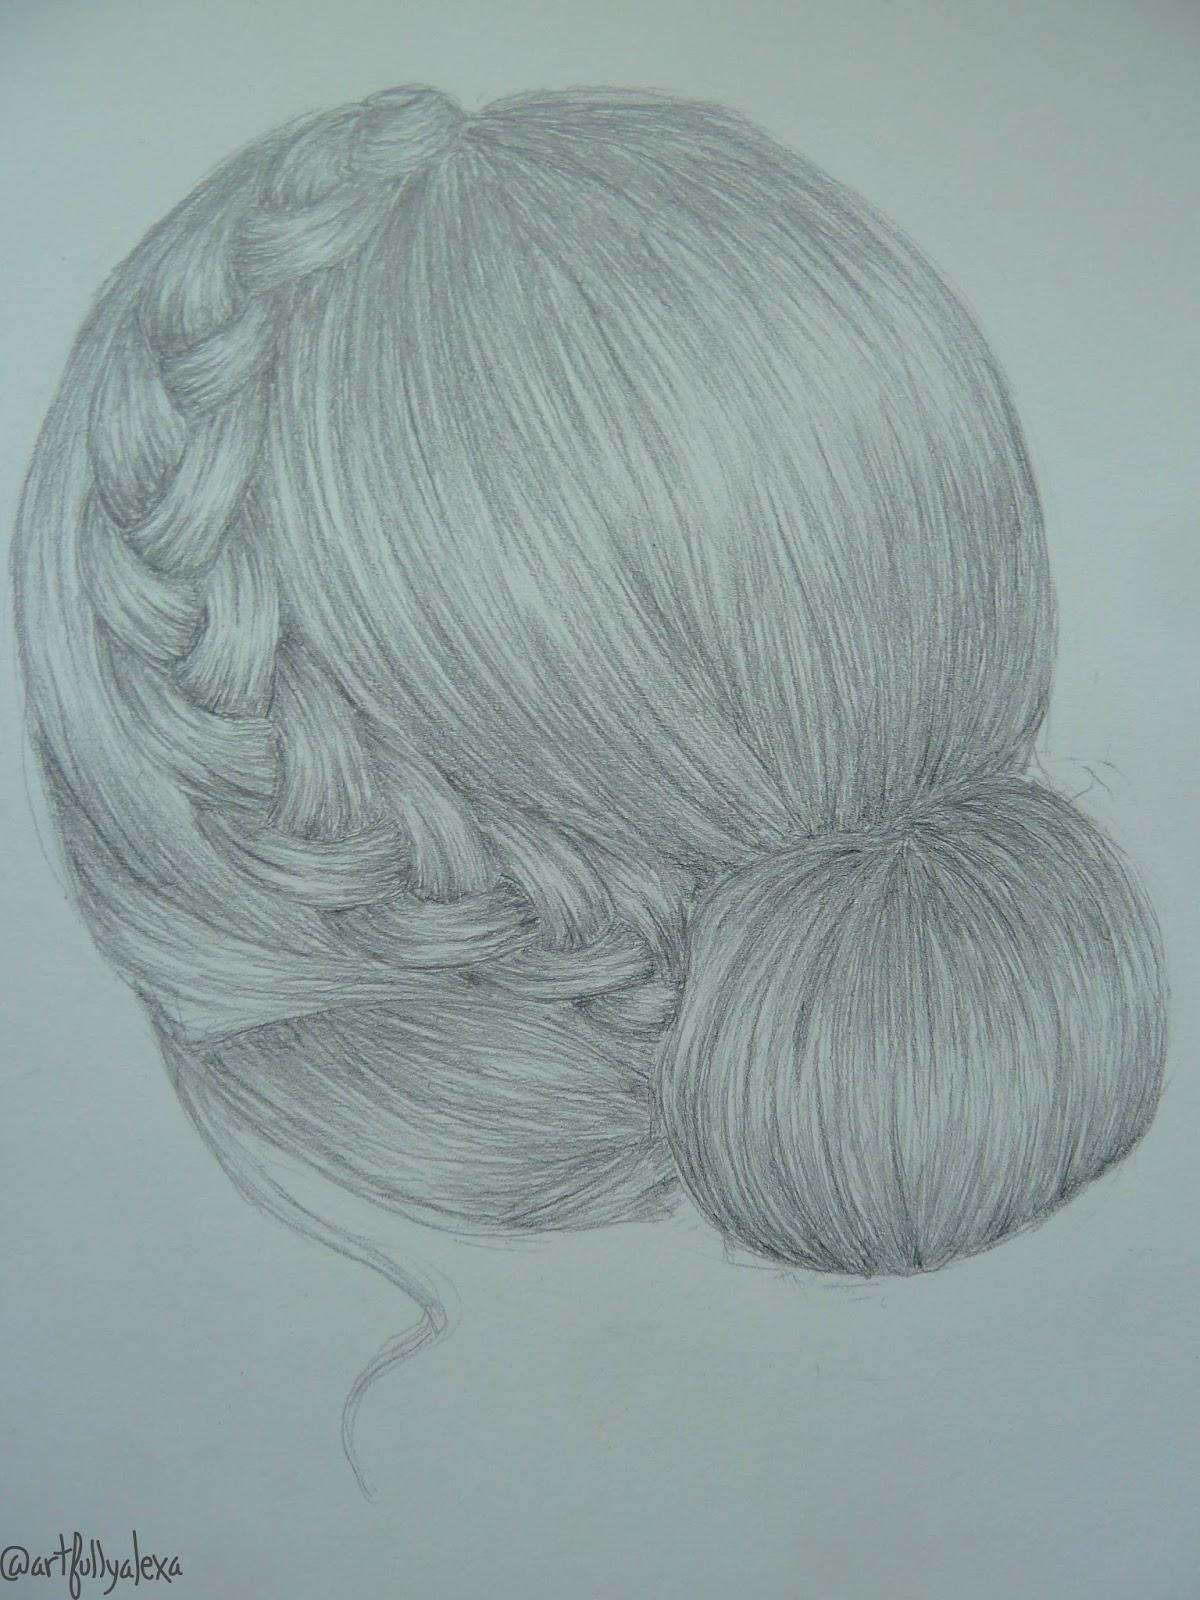 Hair Braid Drawing at GetDrawings | Free download